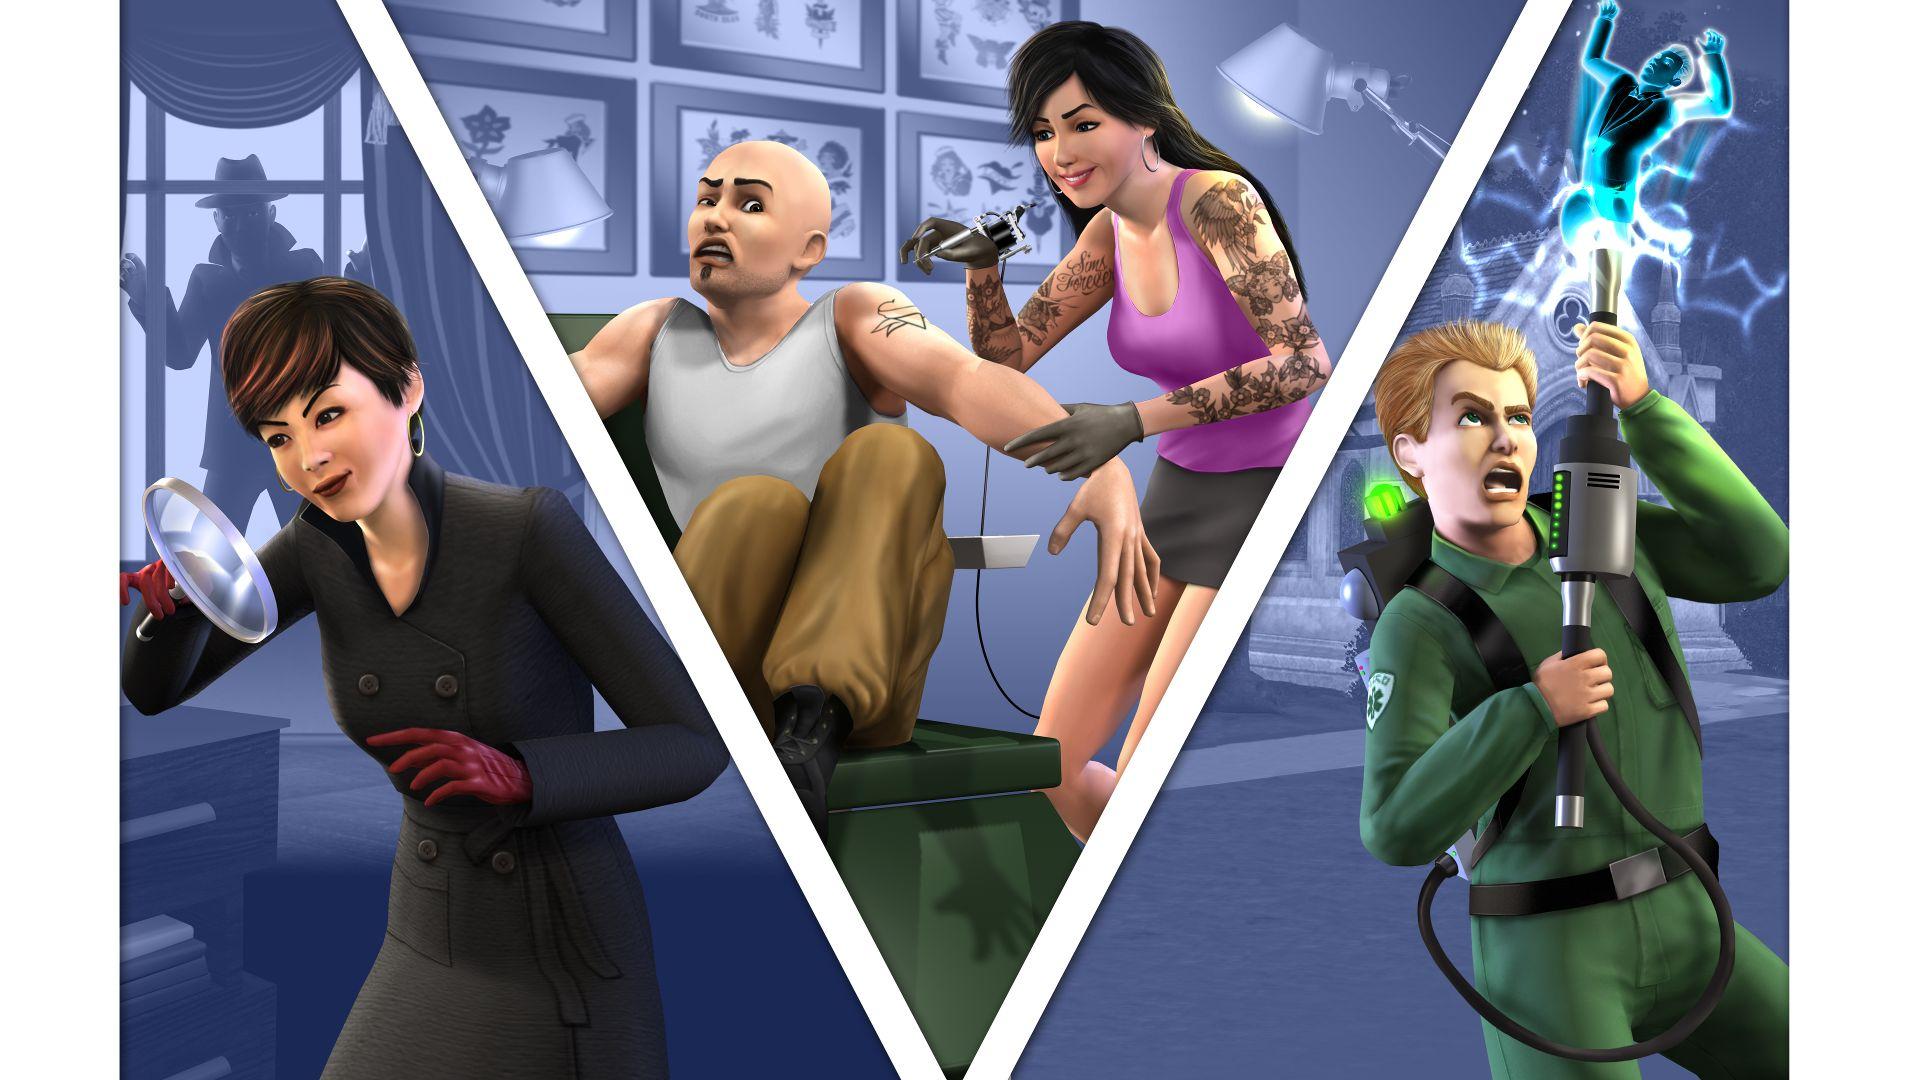 Sims 3 download windows